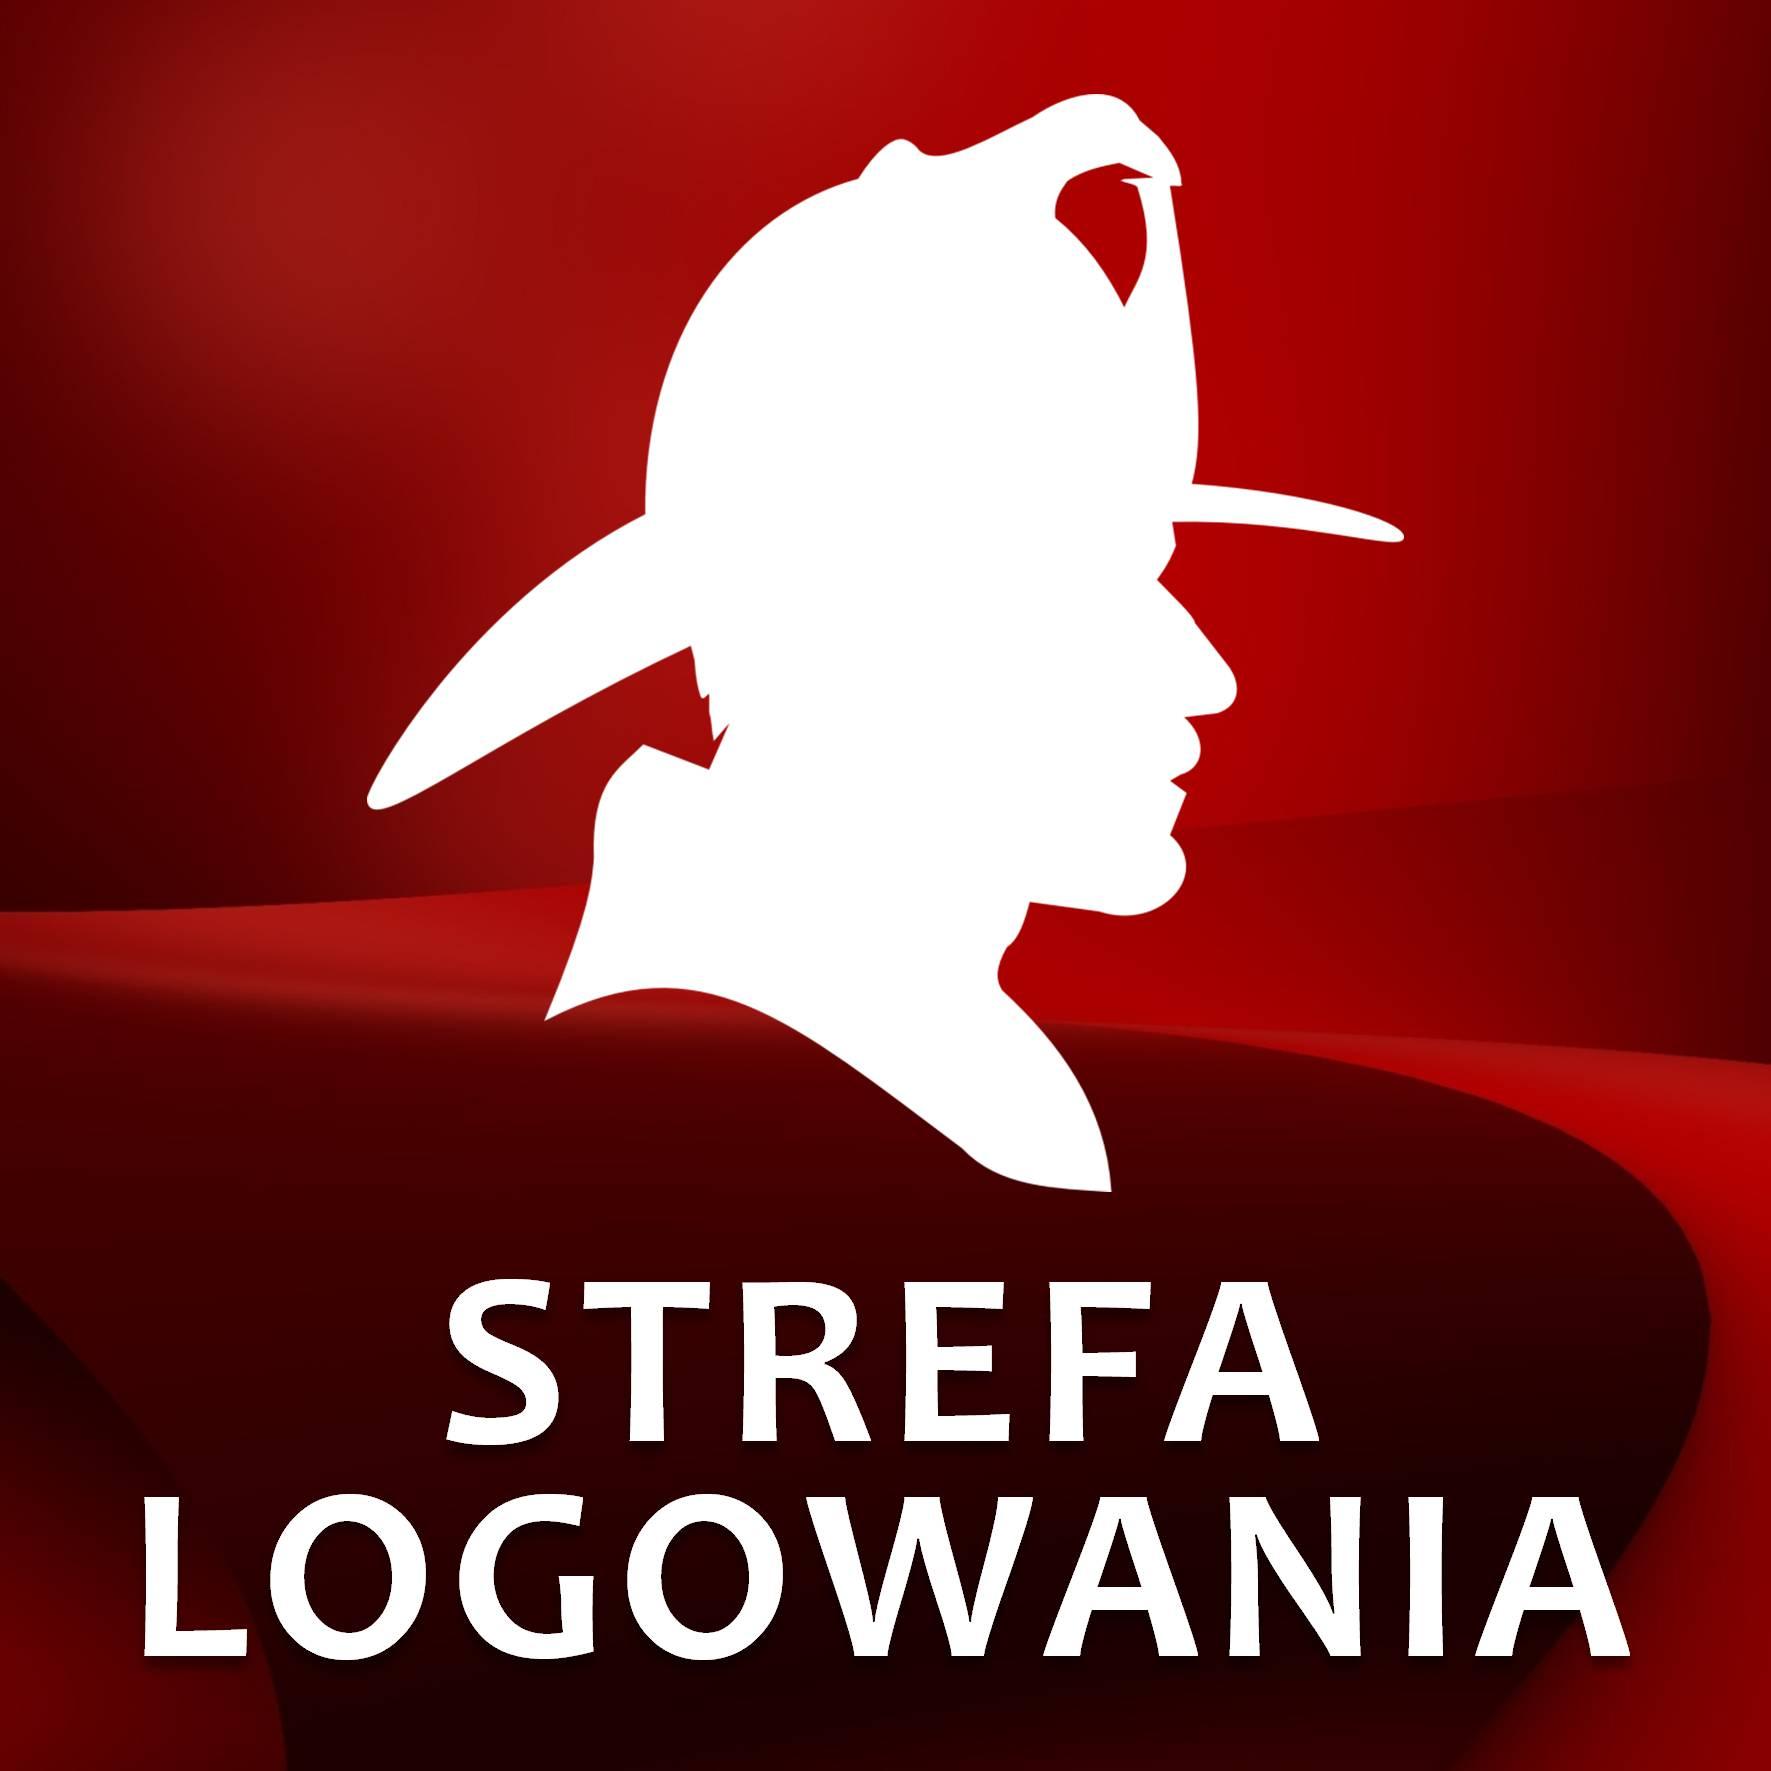 STREFA LOGOWANIA